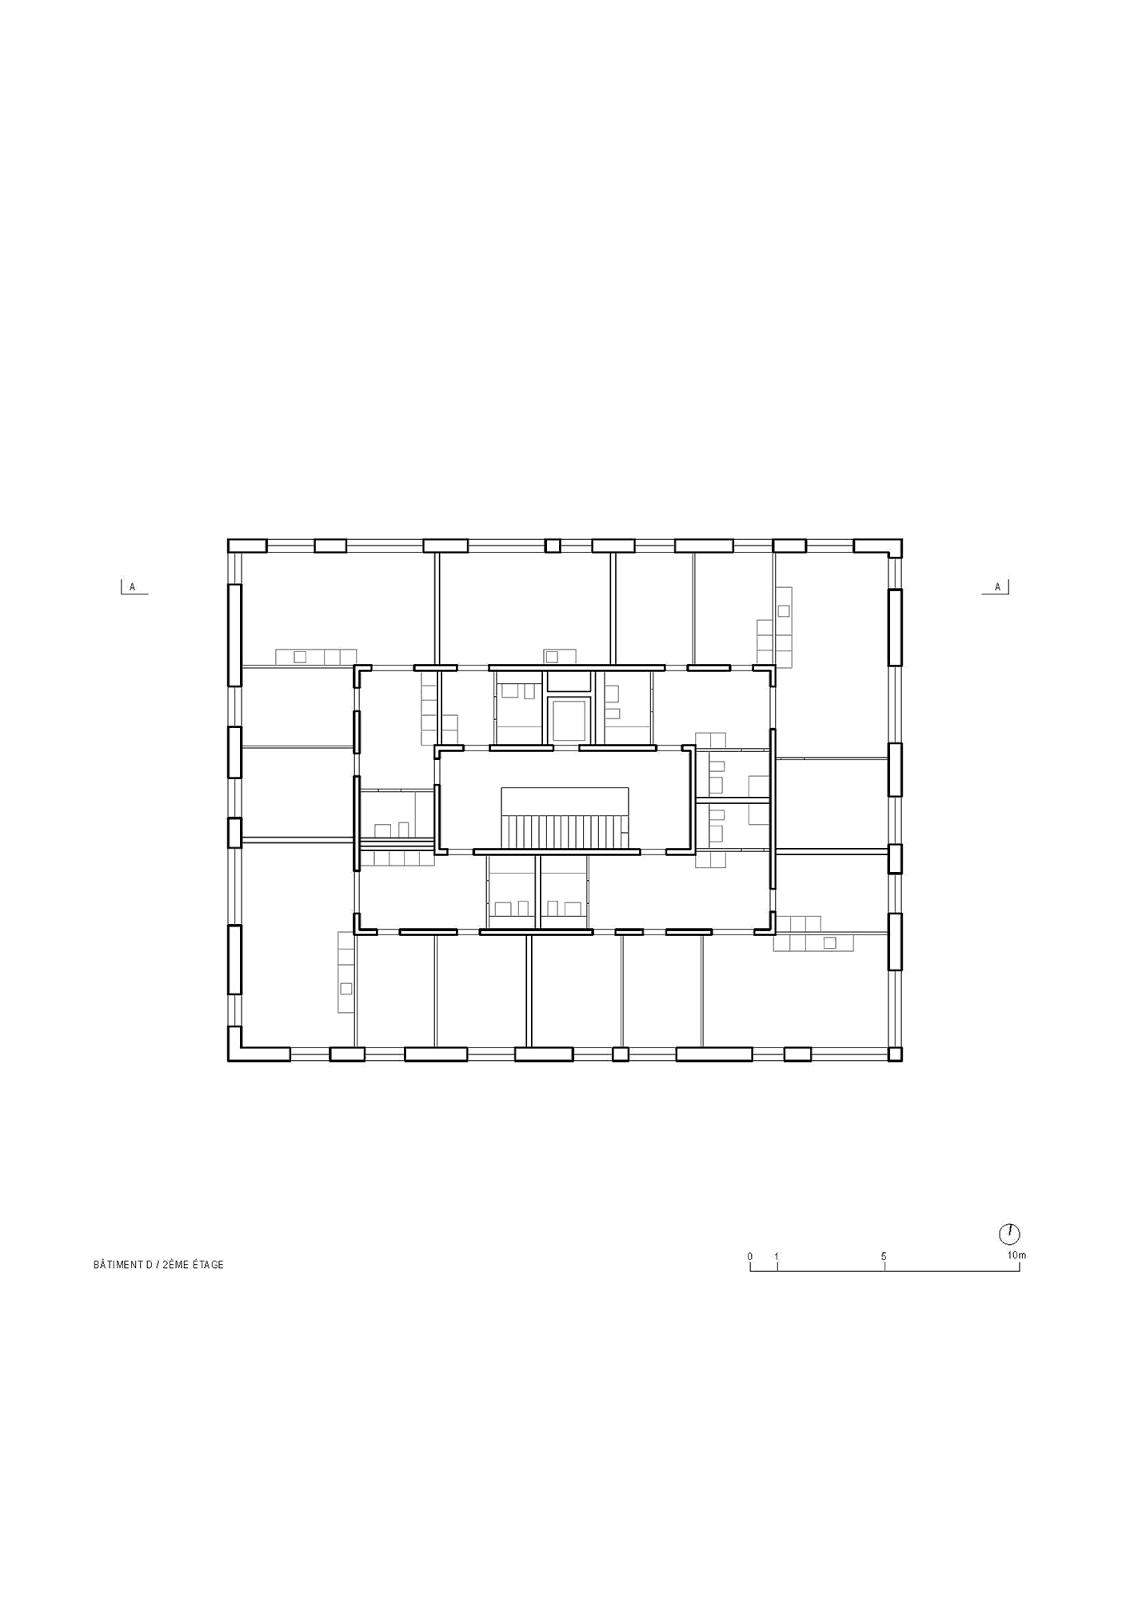 frundgallina social housing carouge – Social Housing Plans